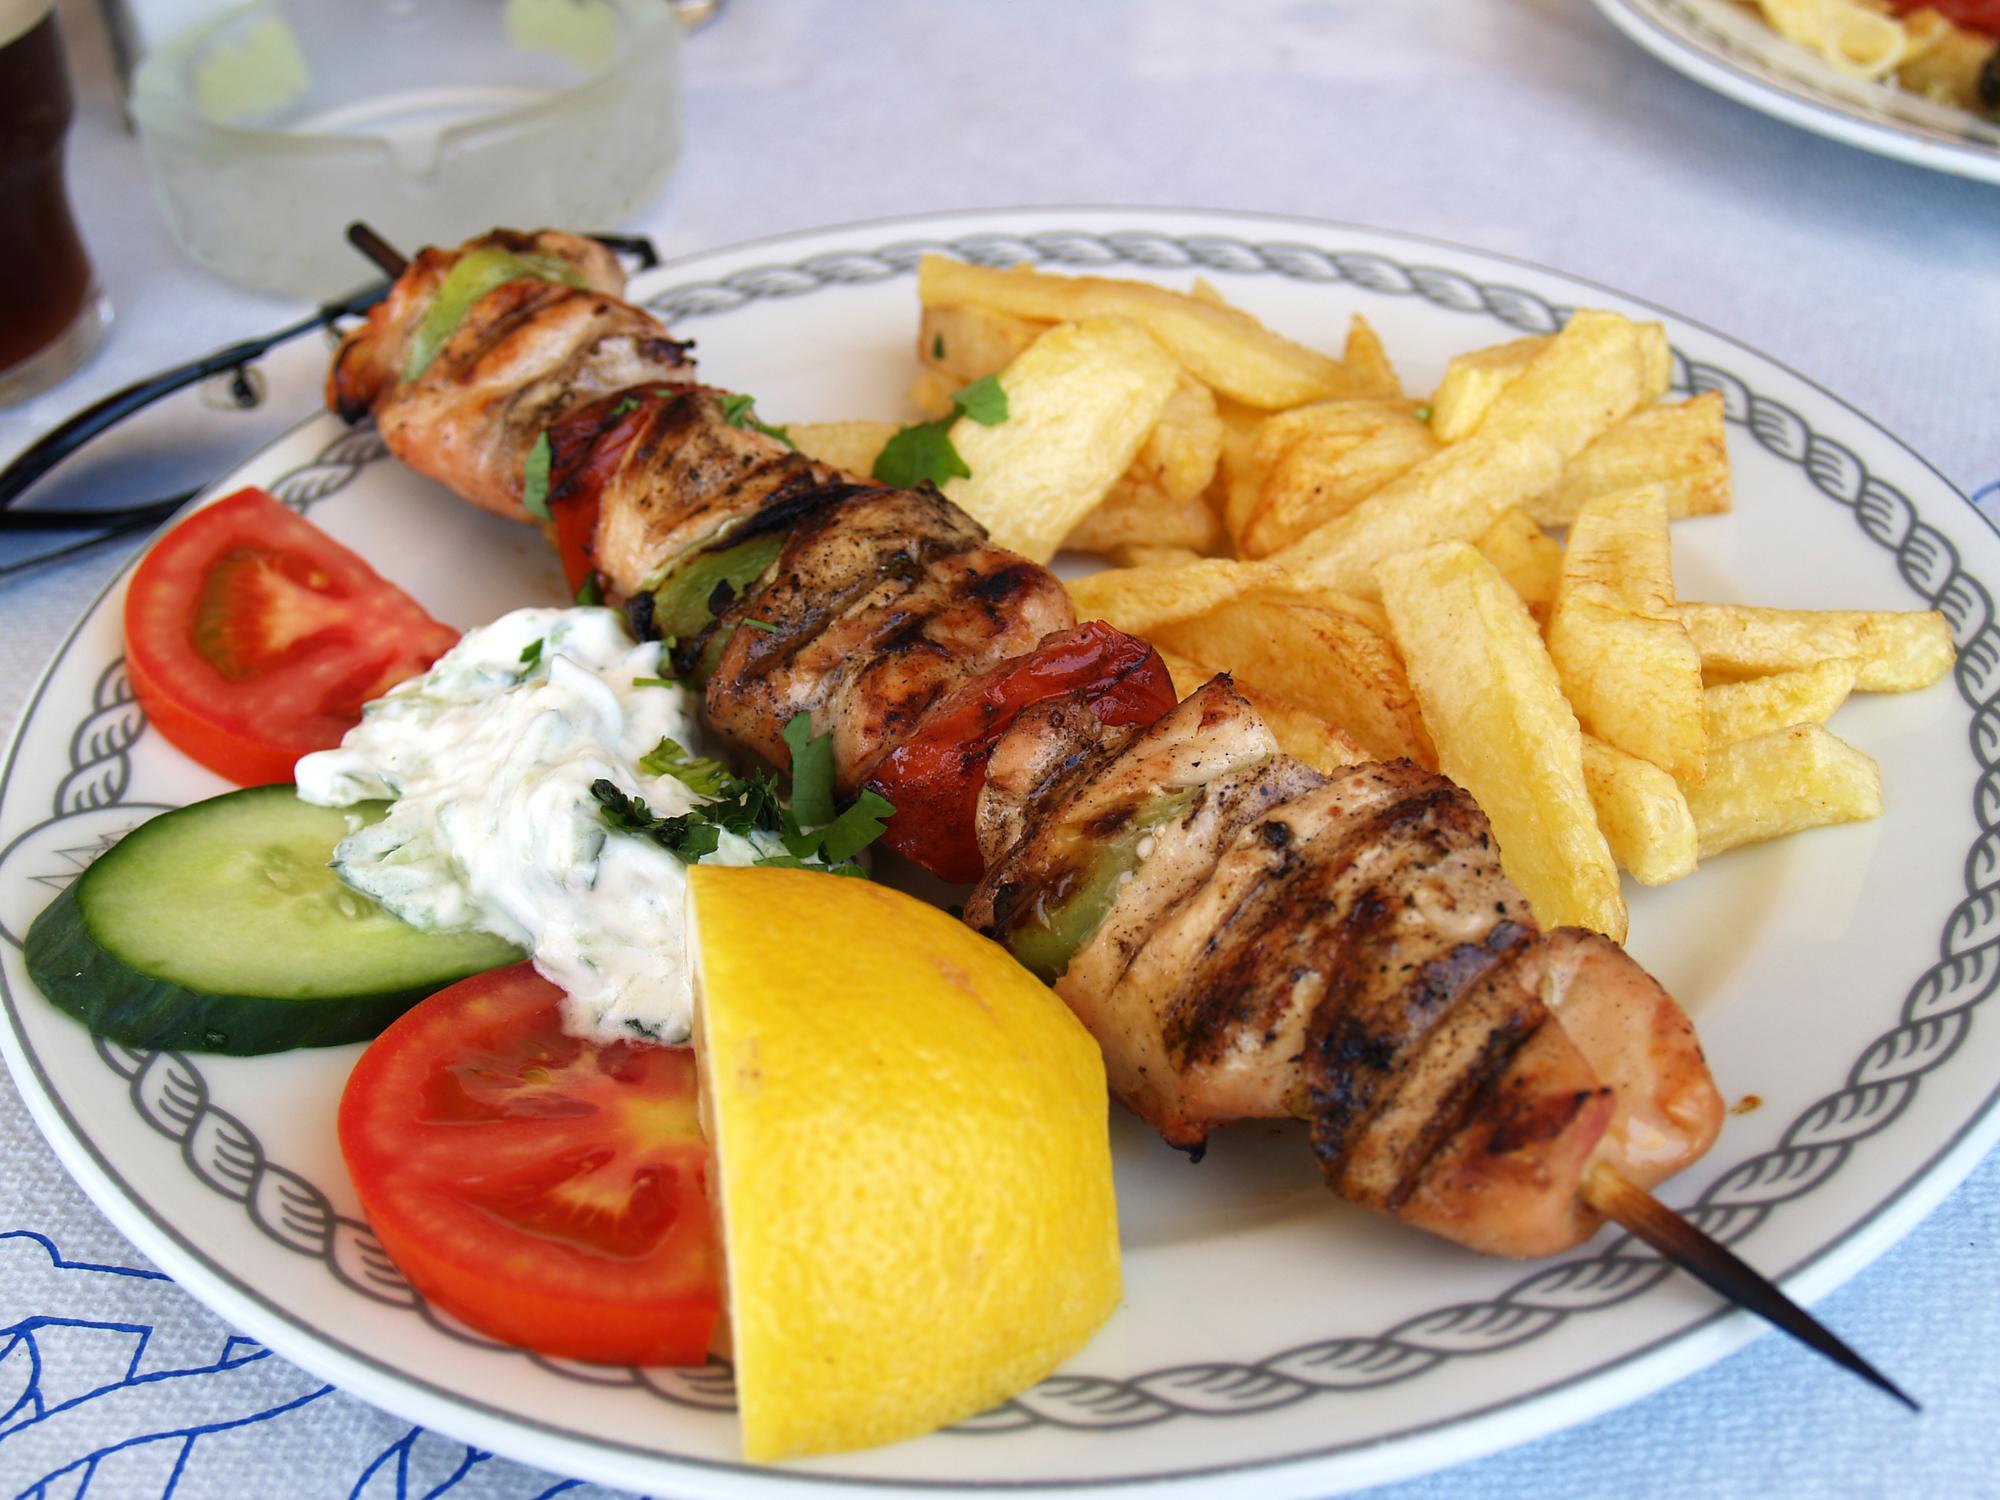 mediteranean food